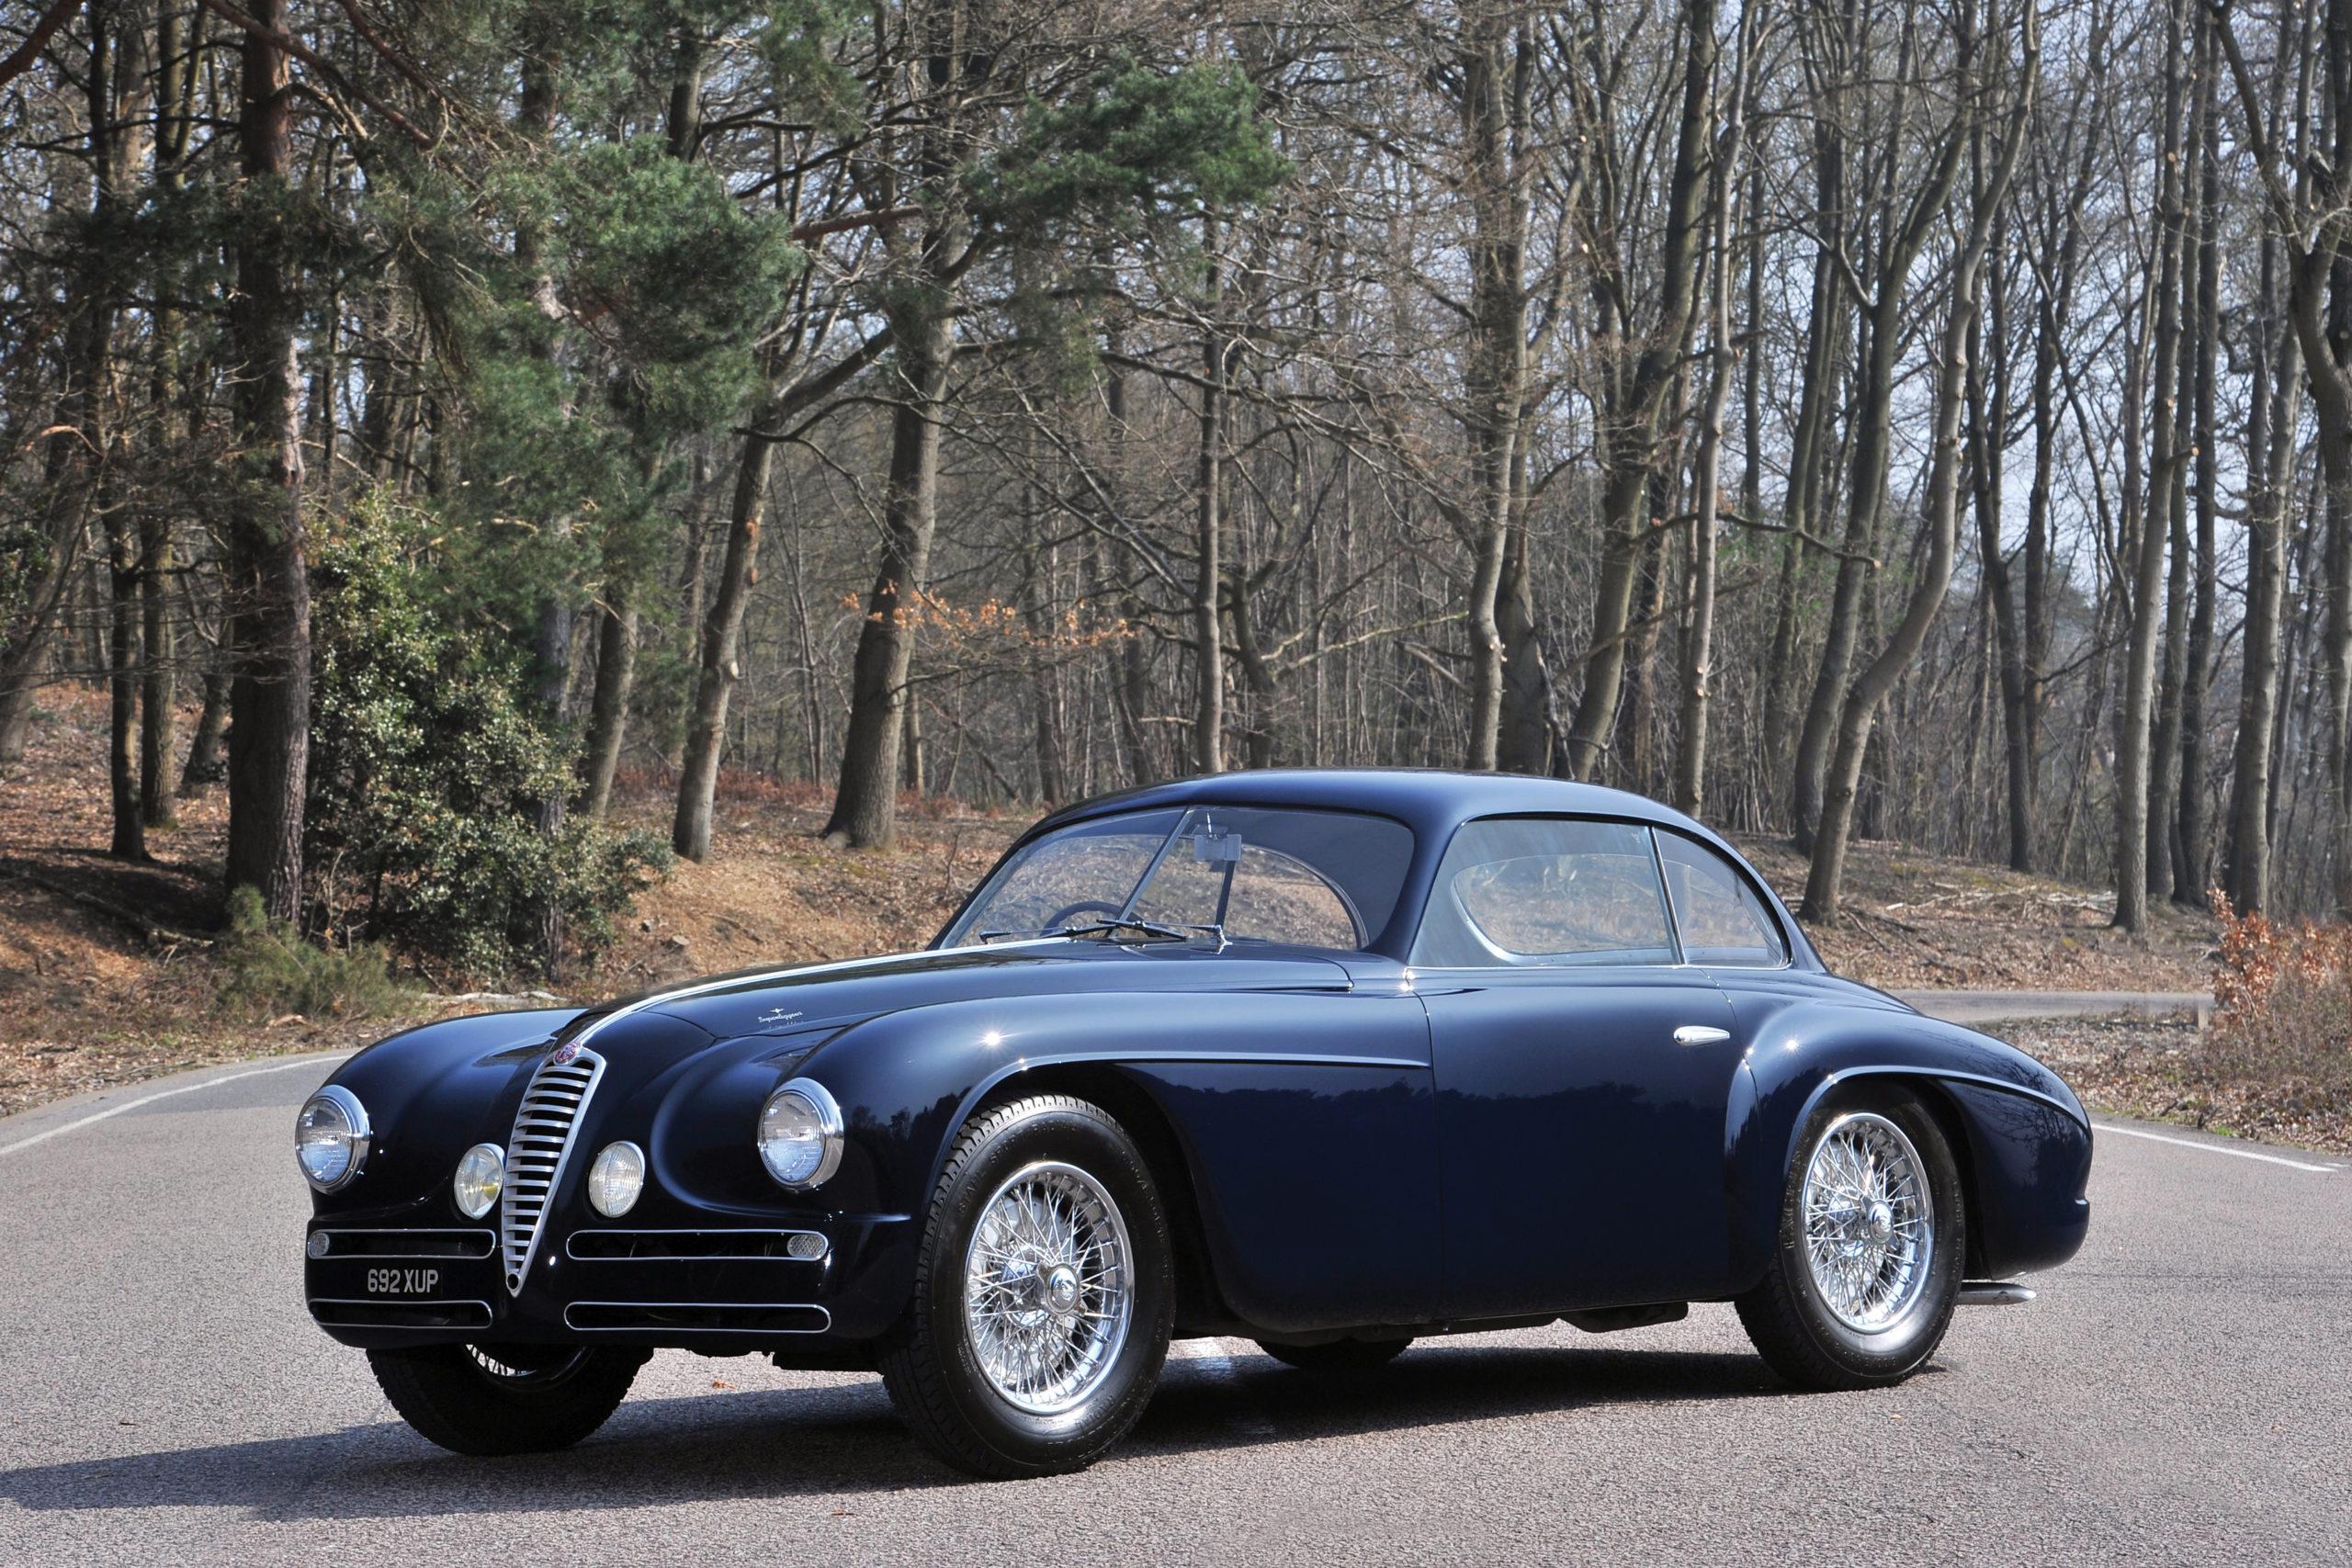 Alfa Romeo 6C 2500 Villa d'Este (1949)